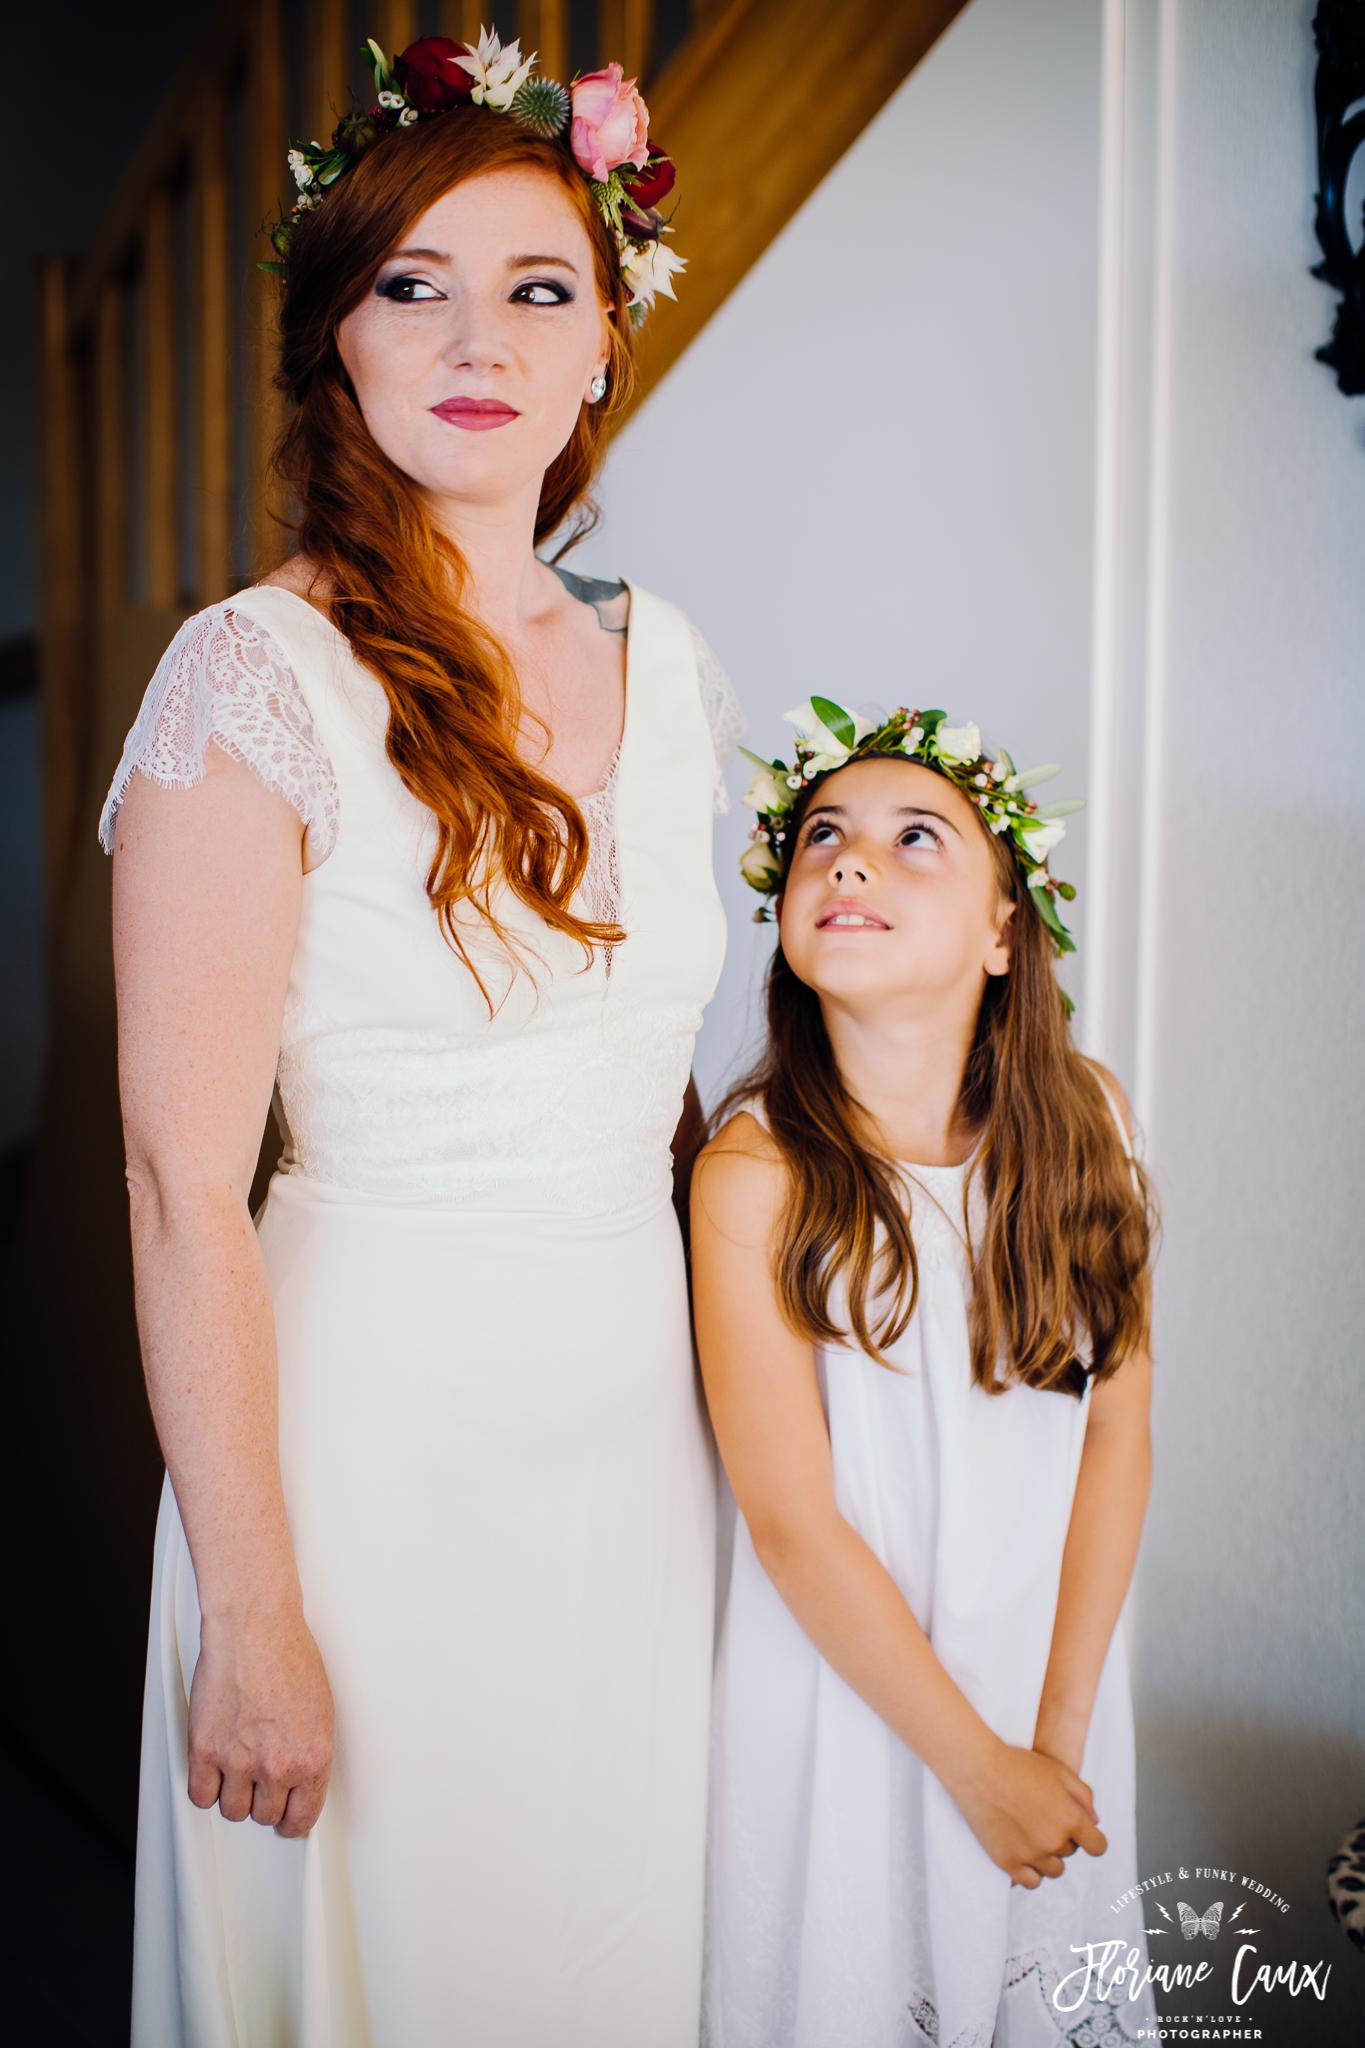 photographe-mariage-toulouse-rocknroll-maries-tatoues-floriane-caux-15